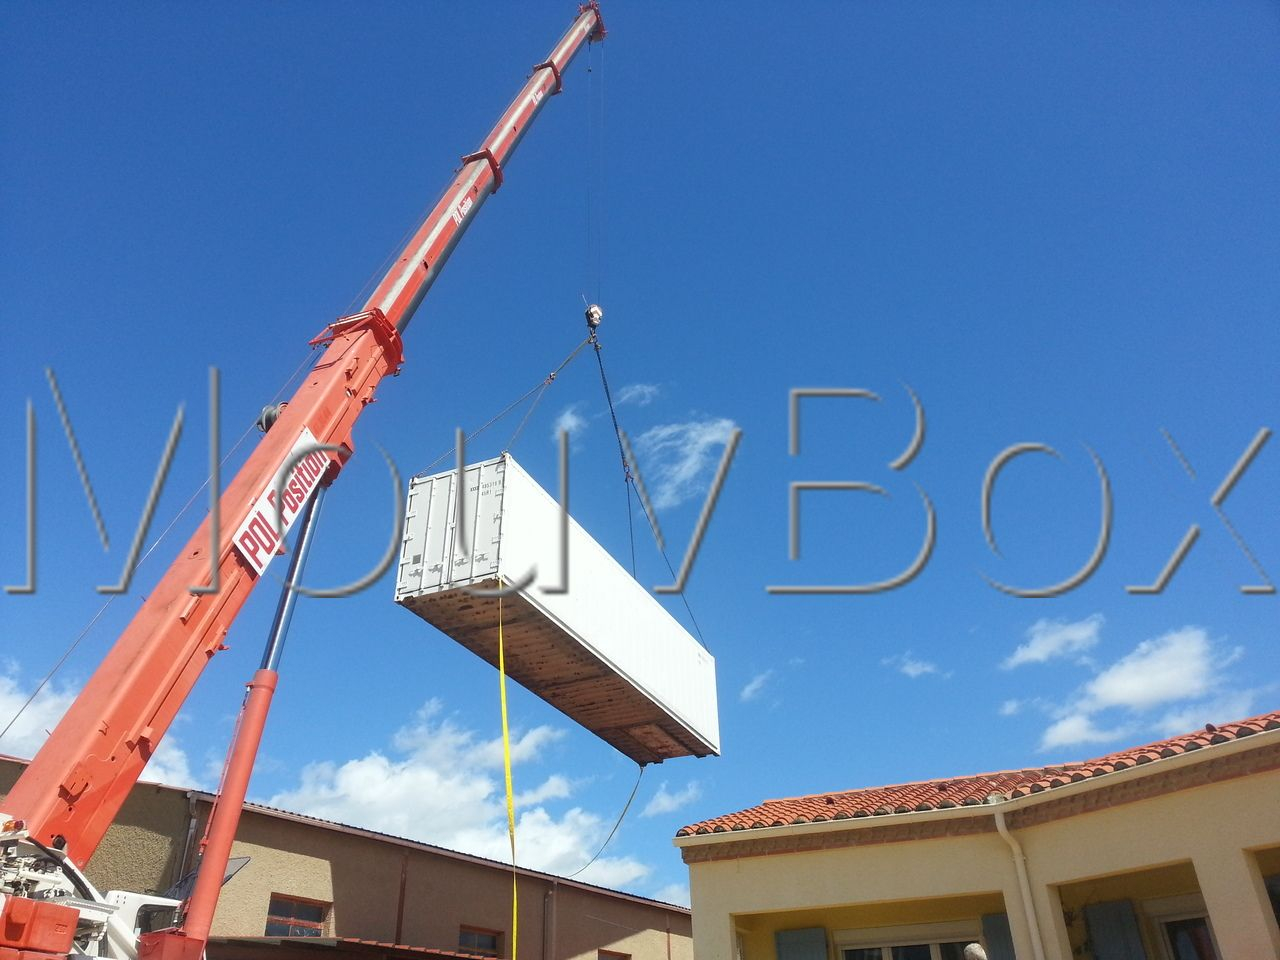 container-conteneur-box-caisson-reefer-40ft-occasion-vente-mouvbox (9)